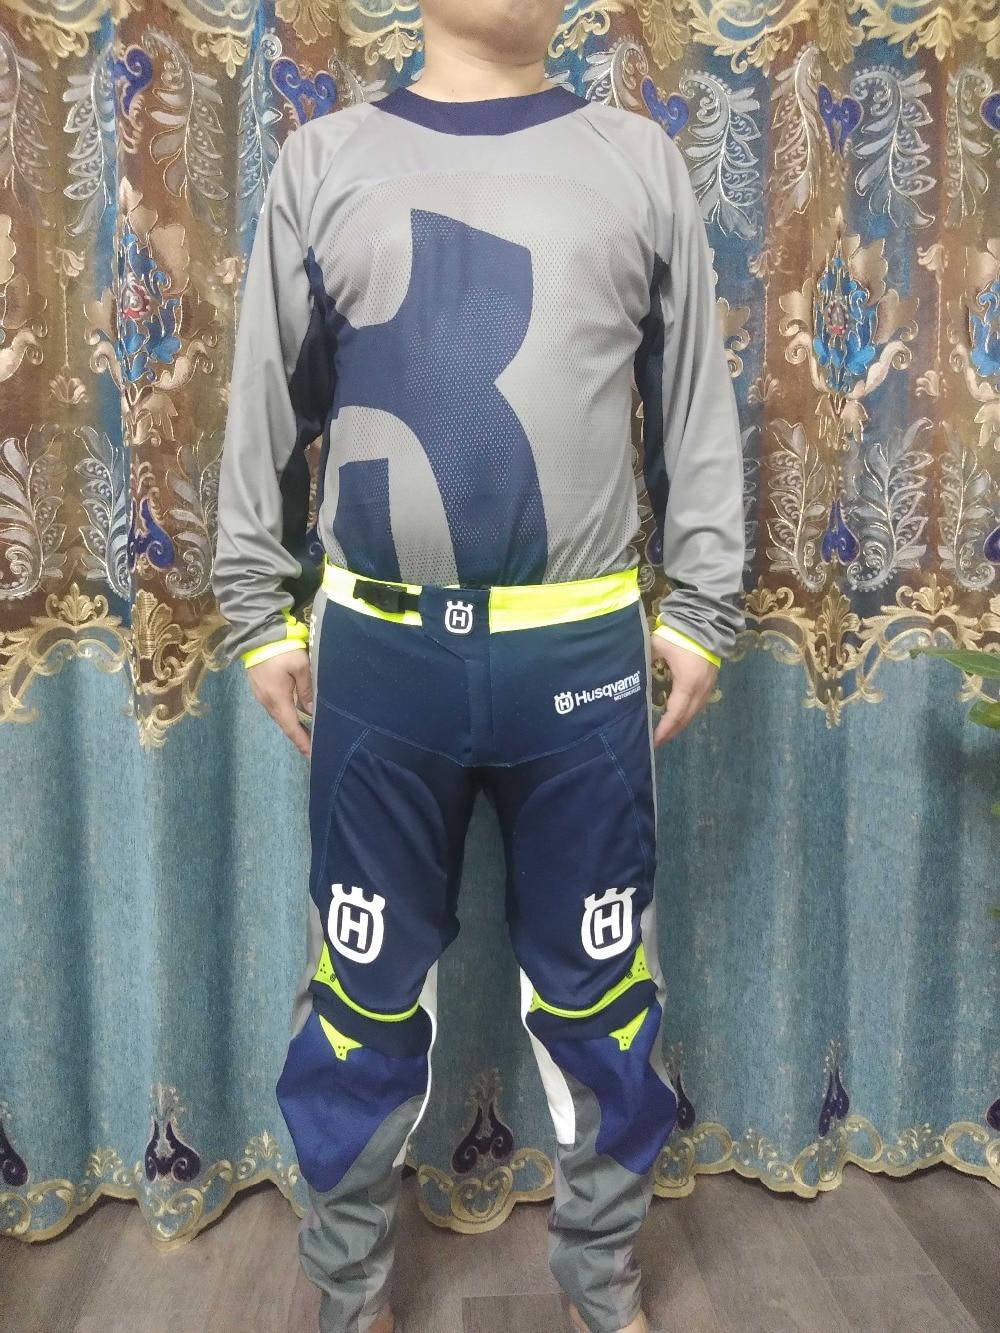 2019 New Gray FOR Husqvarna Husky Style Motocross Suit Motorcycle Racing Jersey Pants combination MX ATV